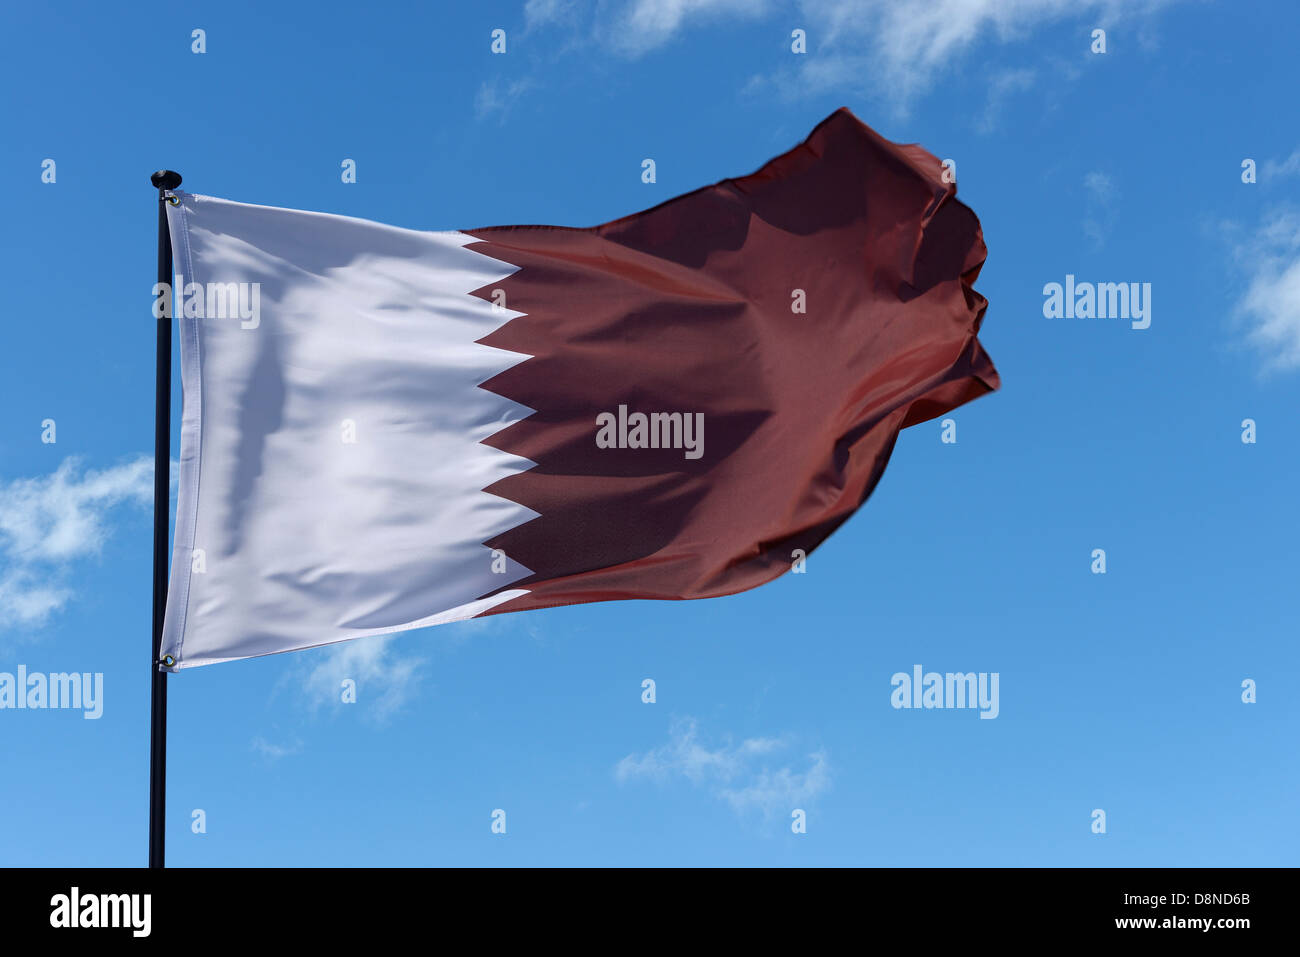 Drapeau national de l'État du Qatar Photo Stock